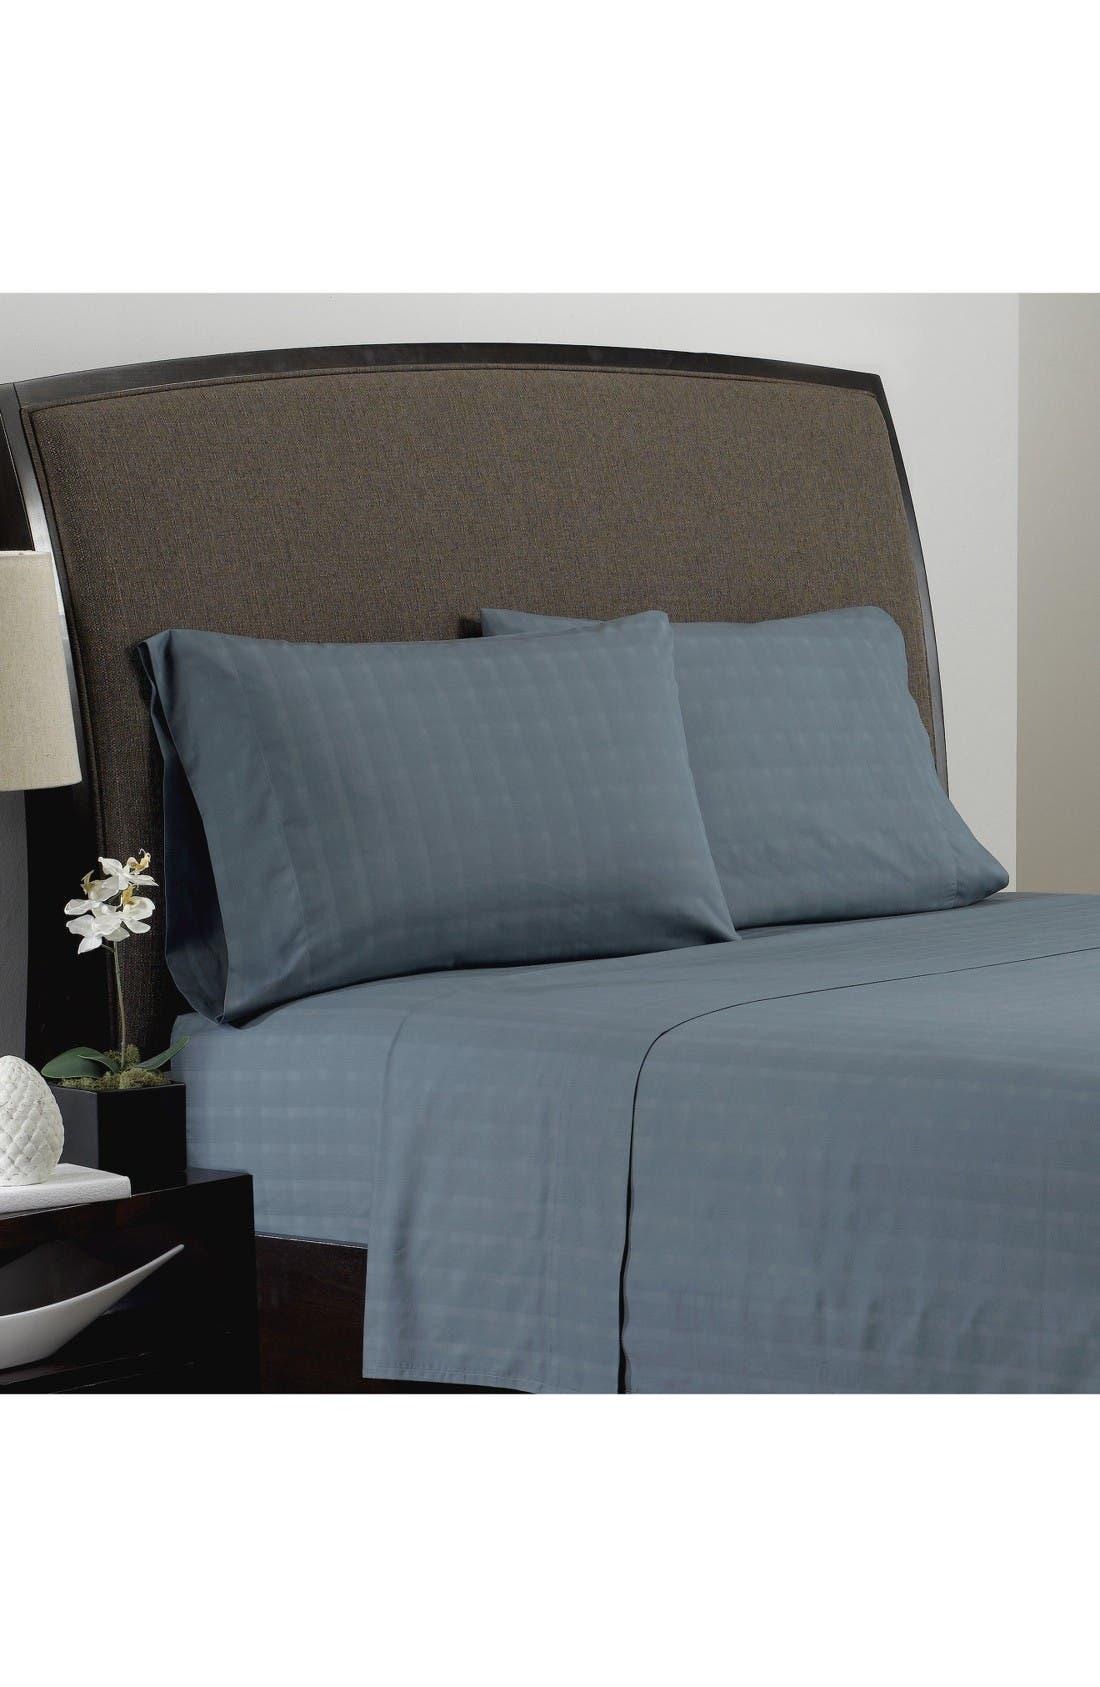 Main Image - Portico Dobby Plaid Pillowcases